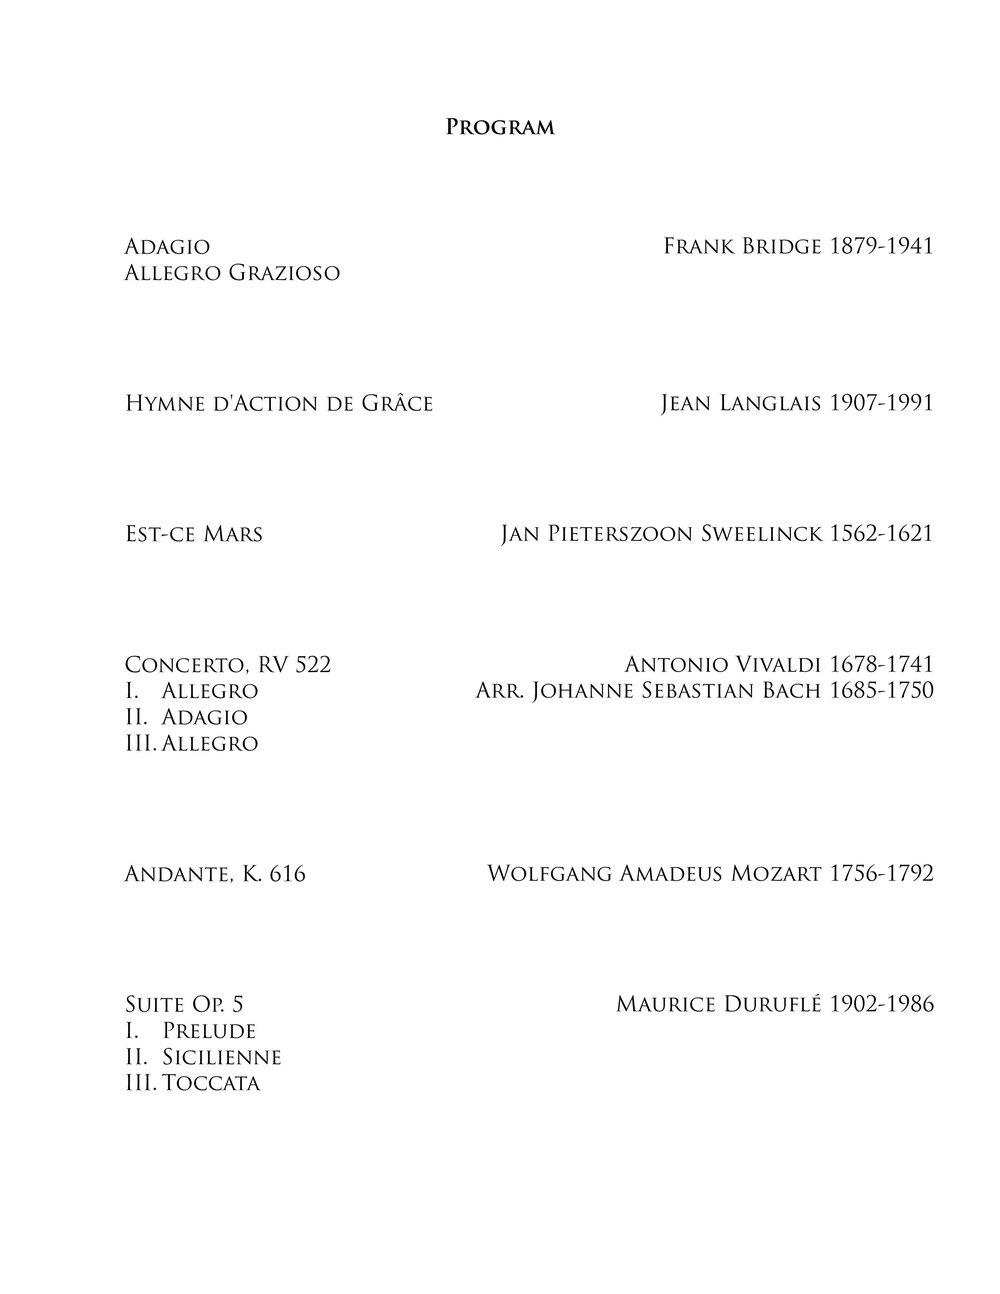 SeniorRecitalProgram copy (1)-page-002.jpg